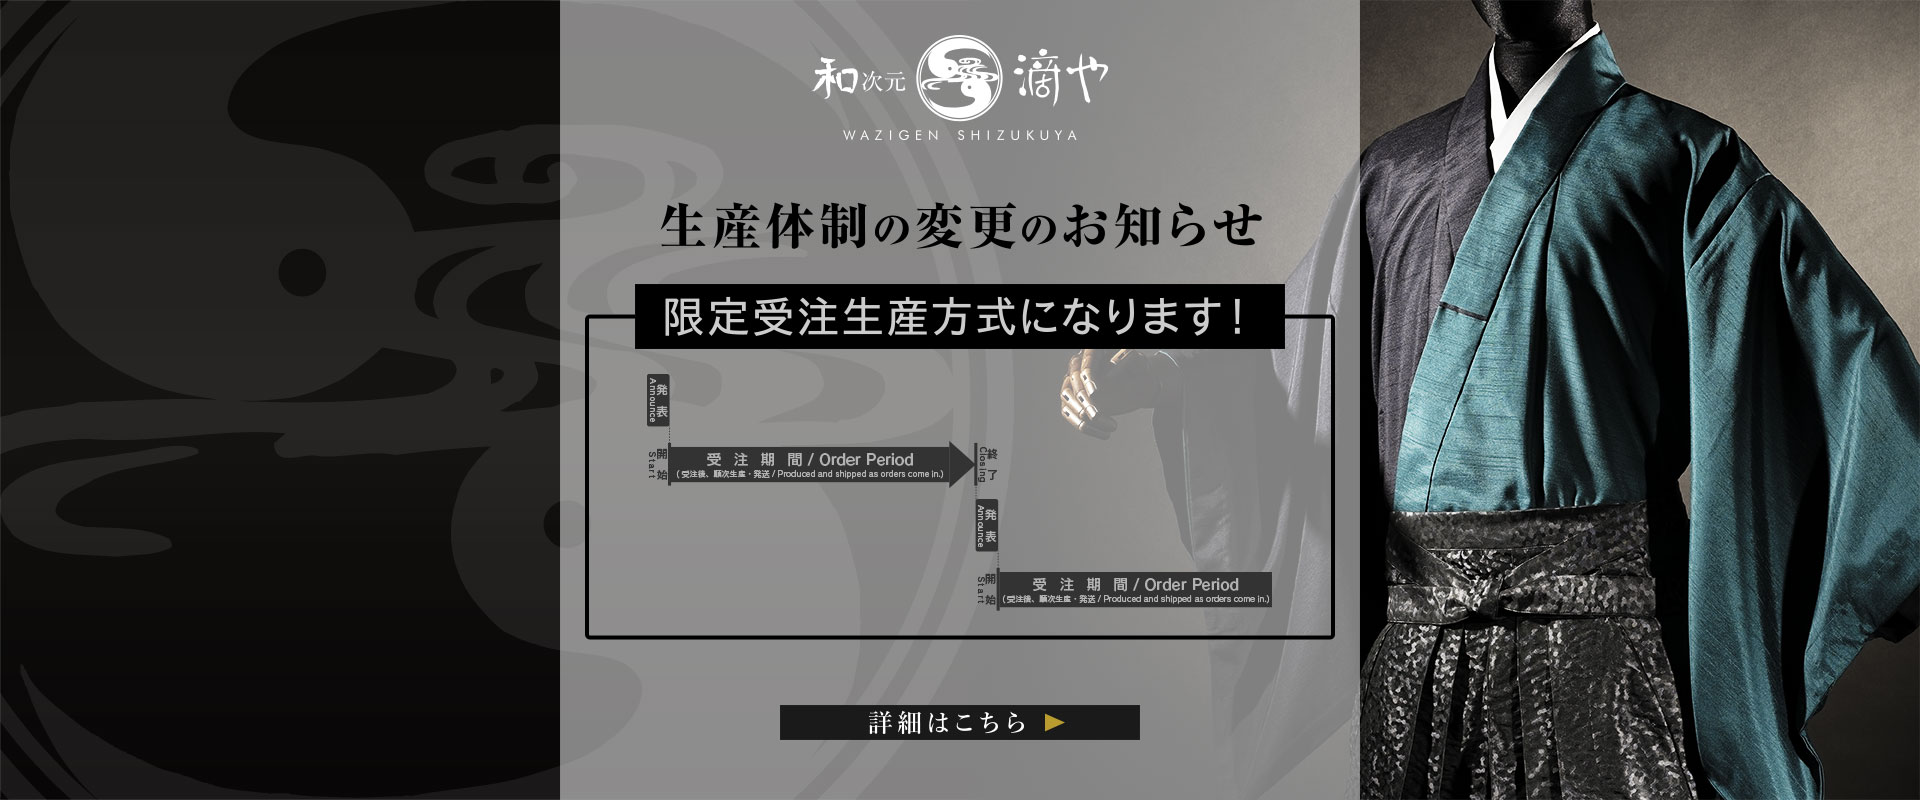 [PHOTO:限定受注生産方式になります!]